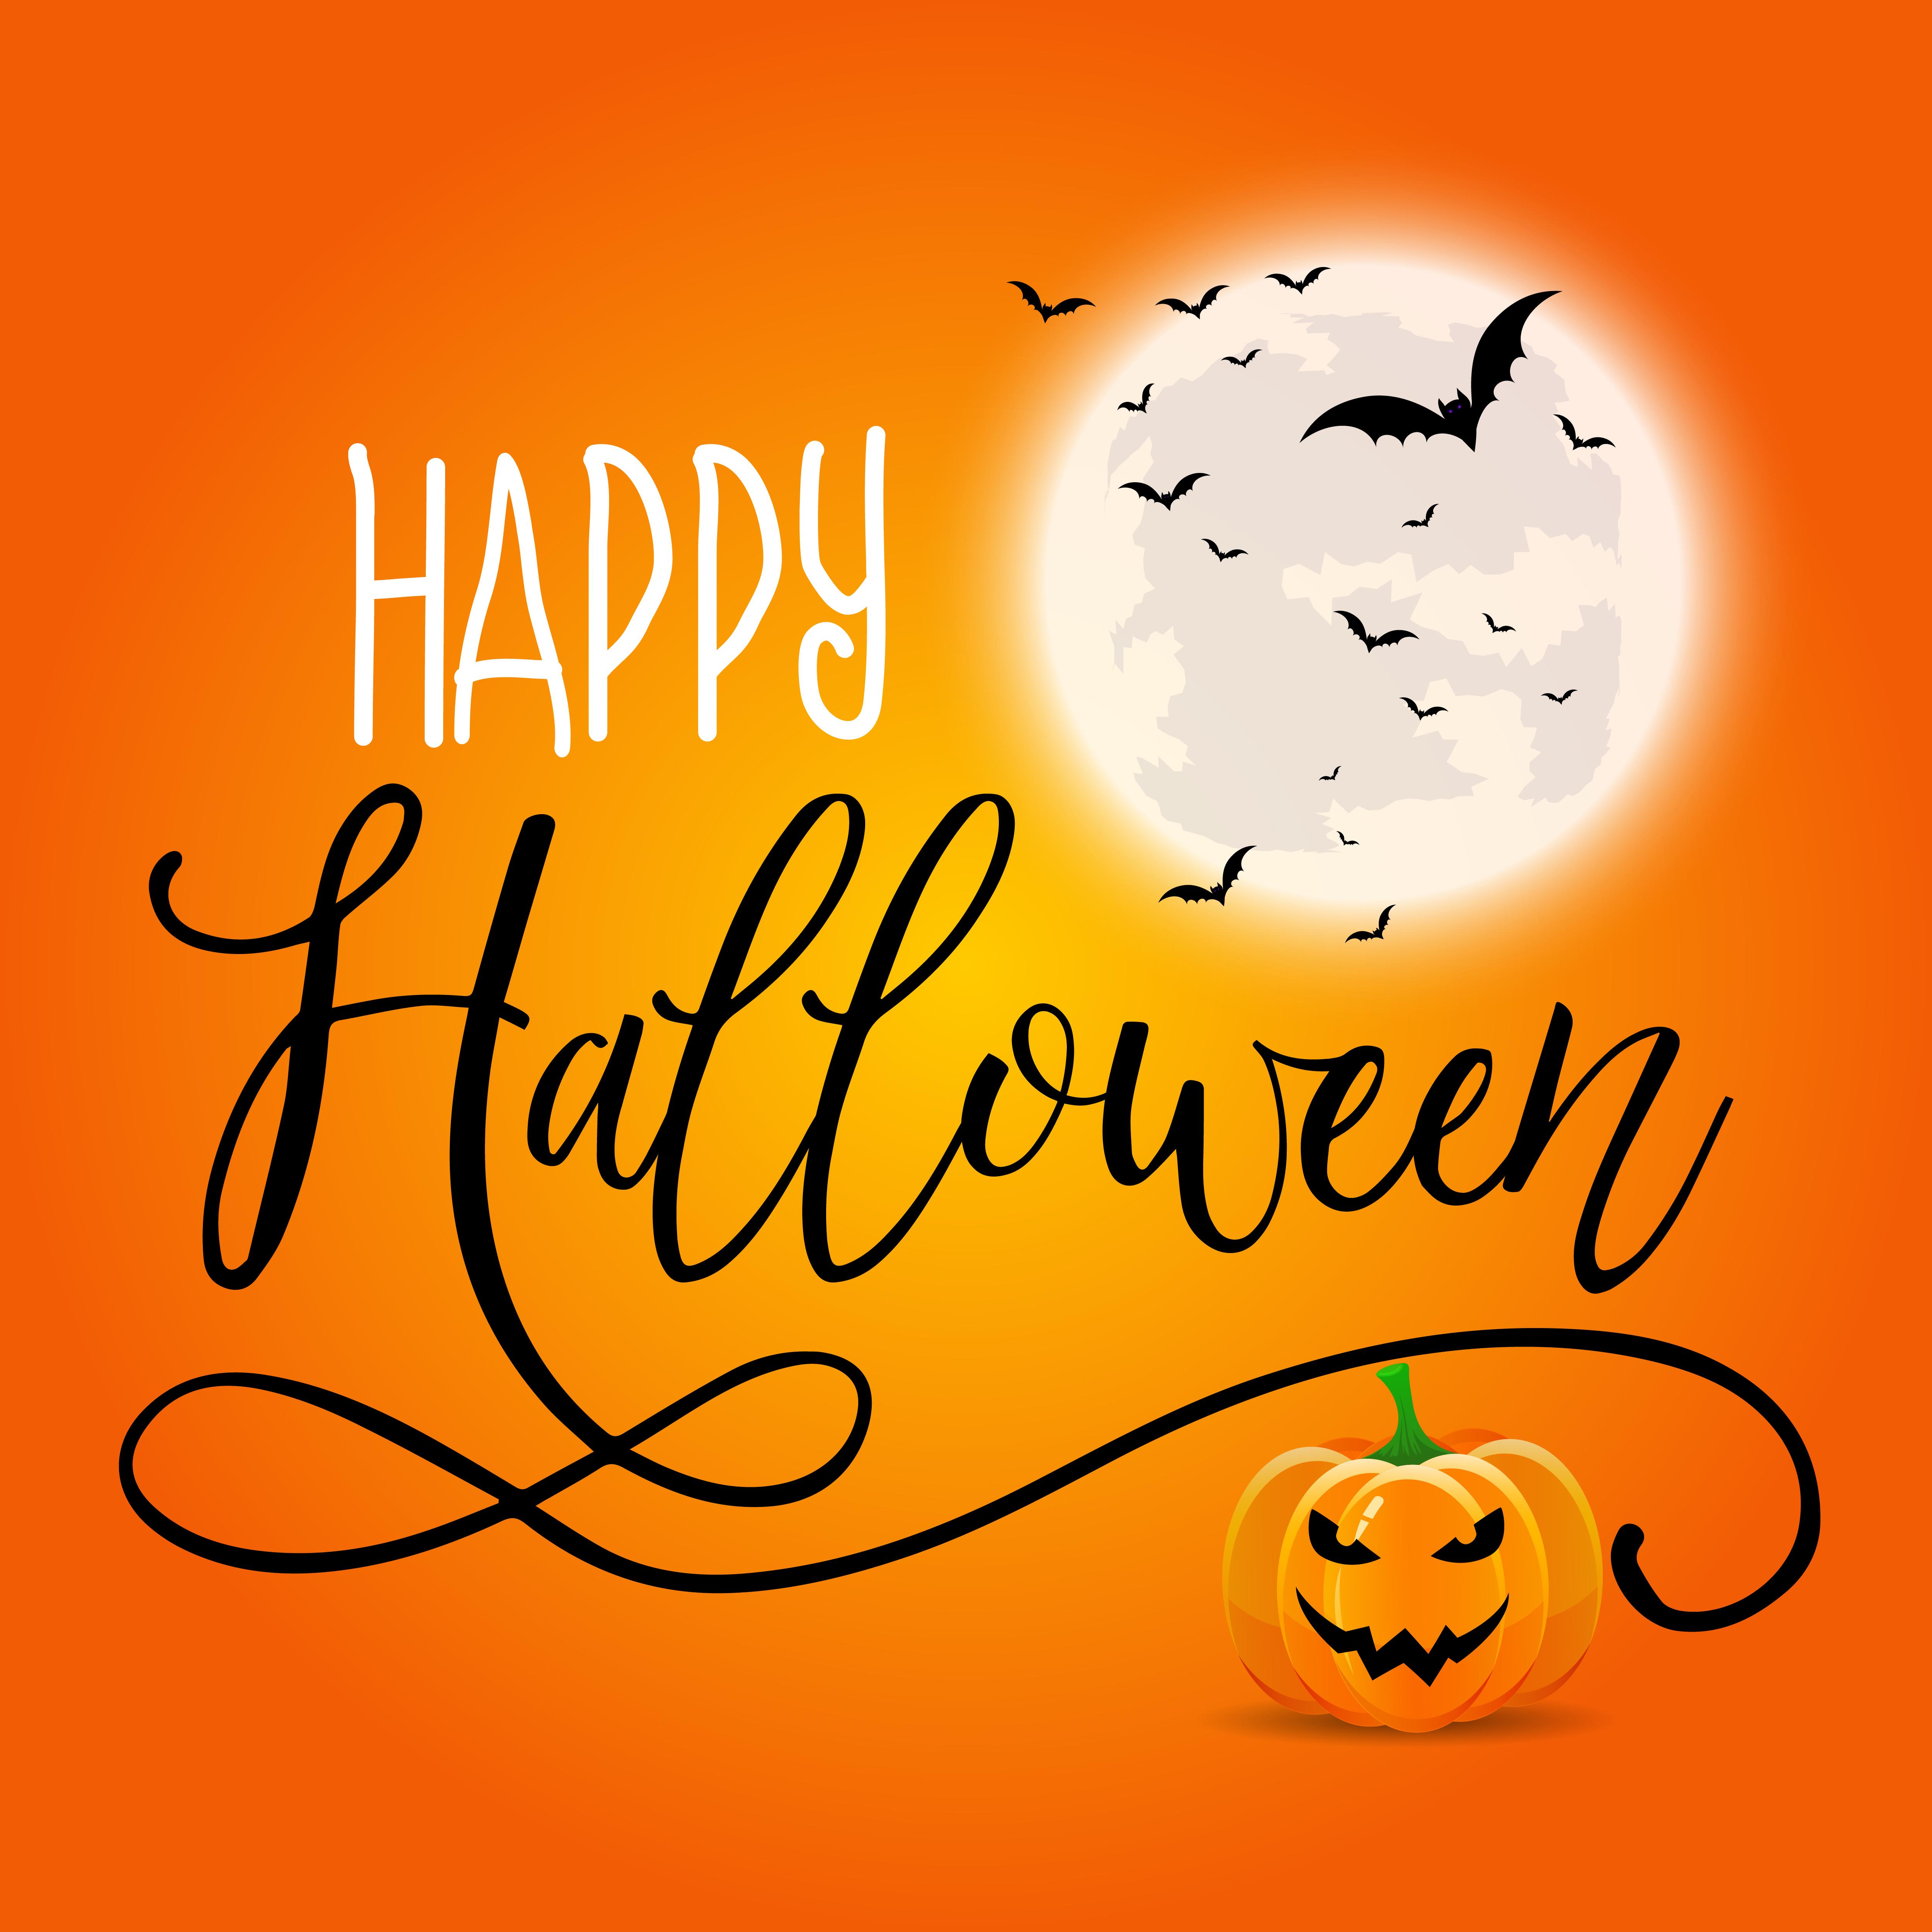 Volantino Halloween, dolcetto o scherzetto?